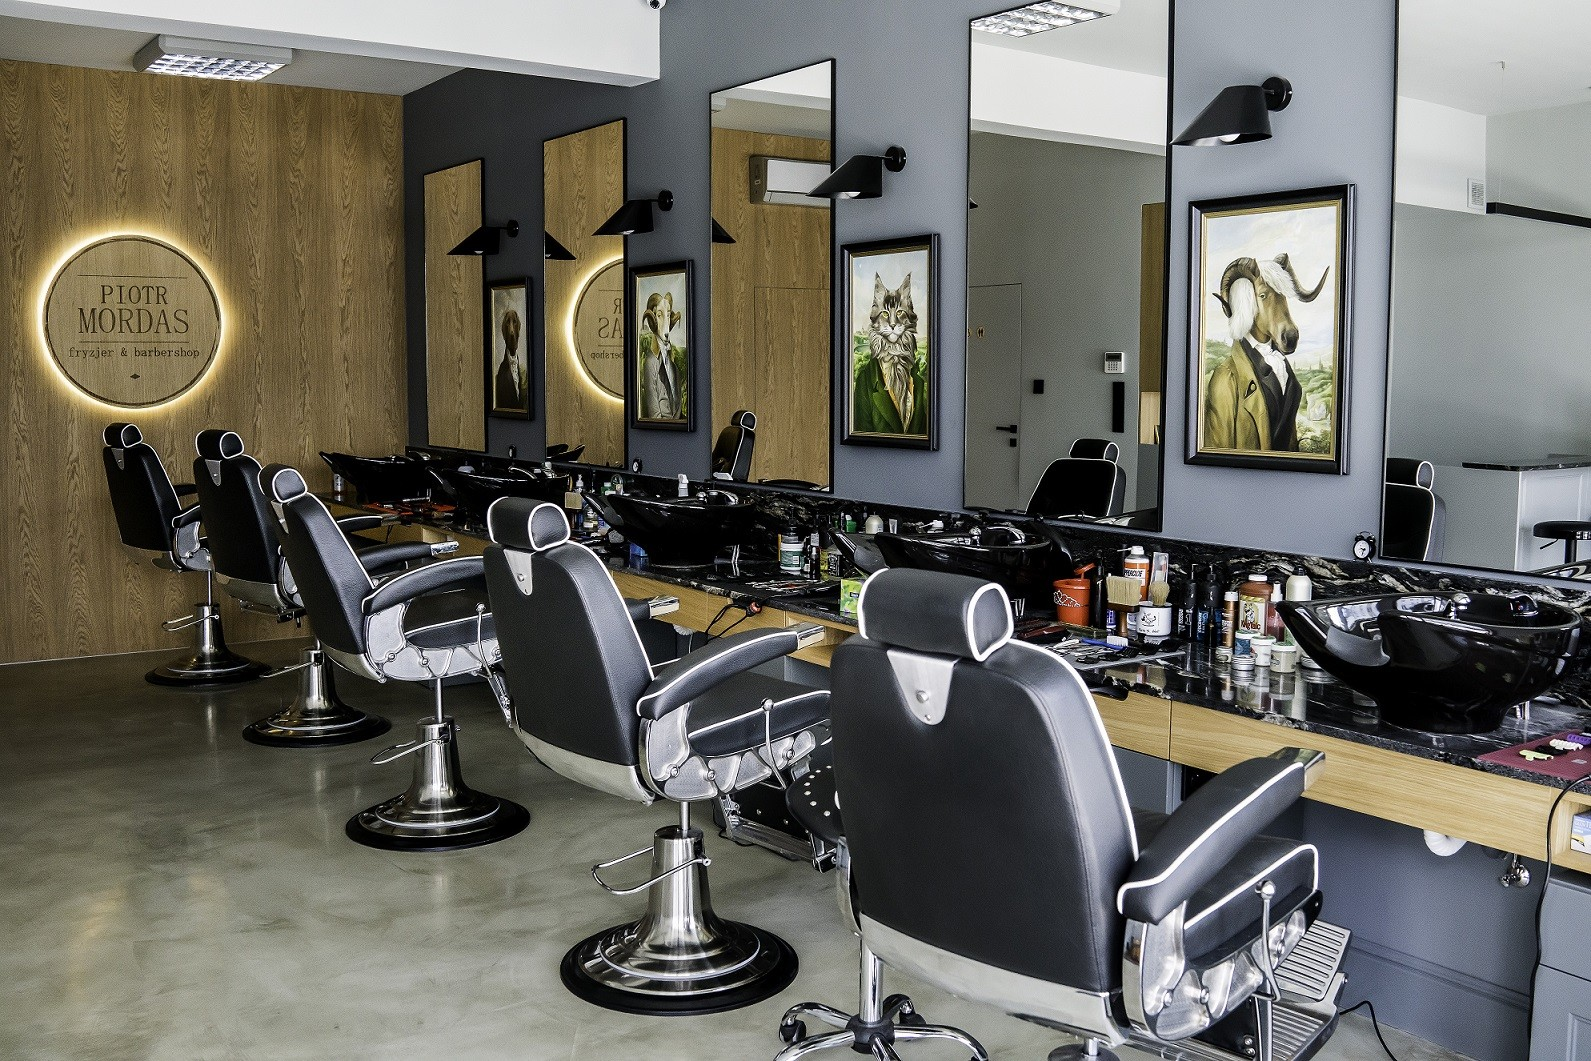 Barbershop Białystok Strzyżenie Brody Barber I Golibroda Piotr Mordas